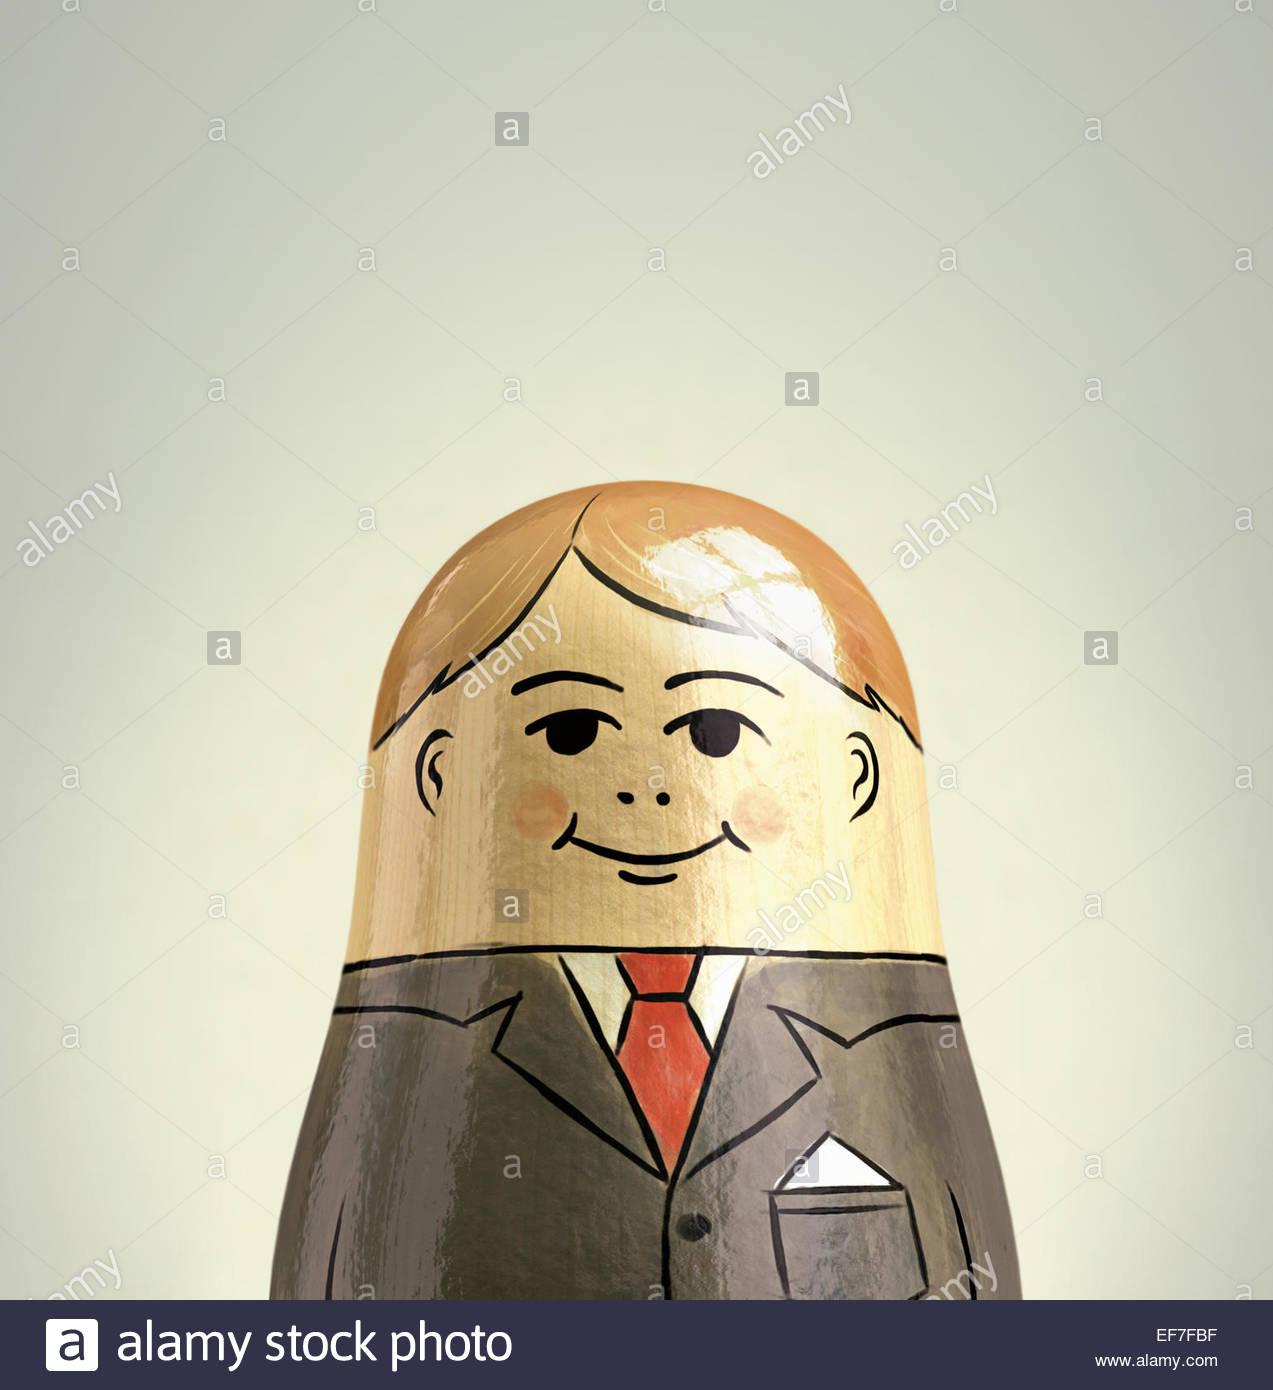 Felice, sorridente imprenditore bambola di nesting Immagini Stock